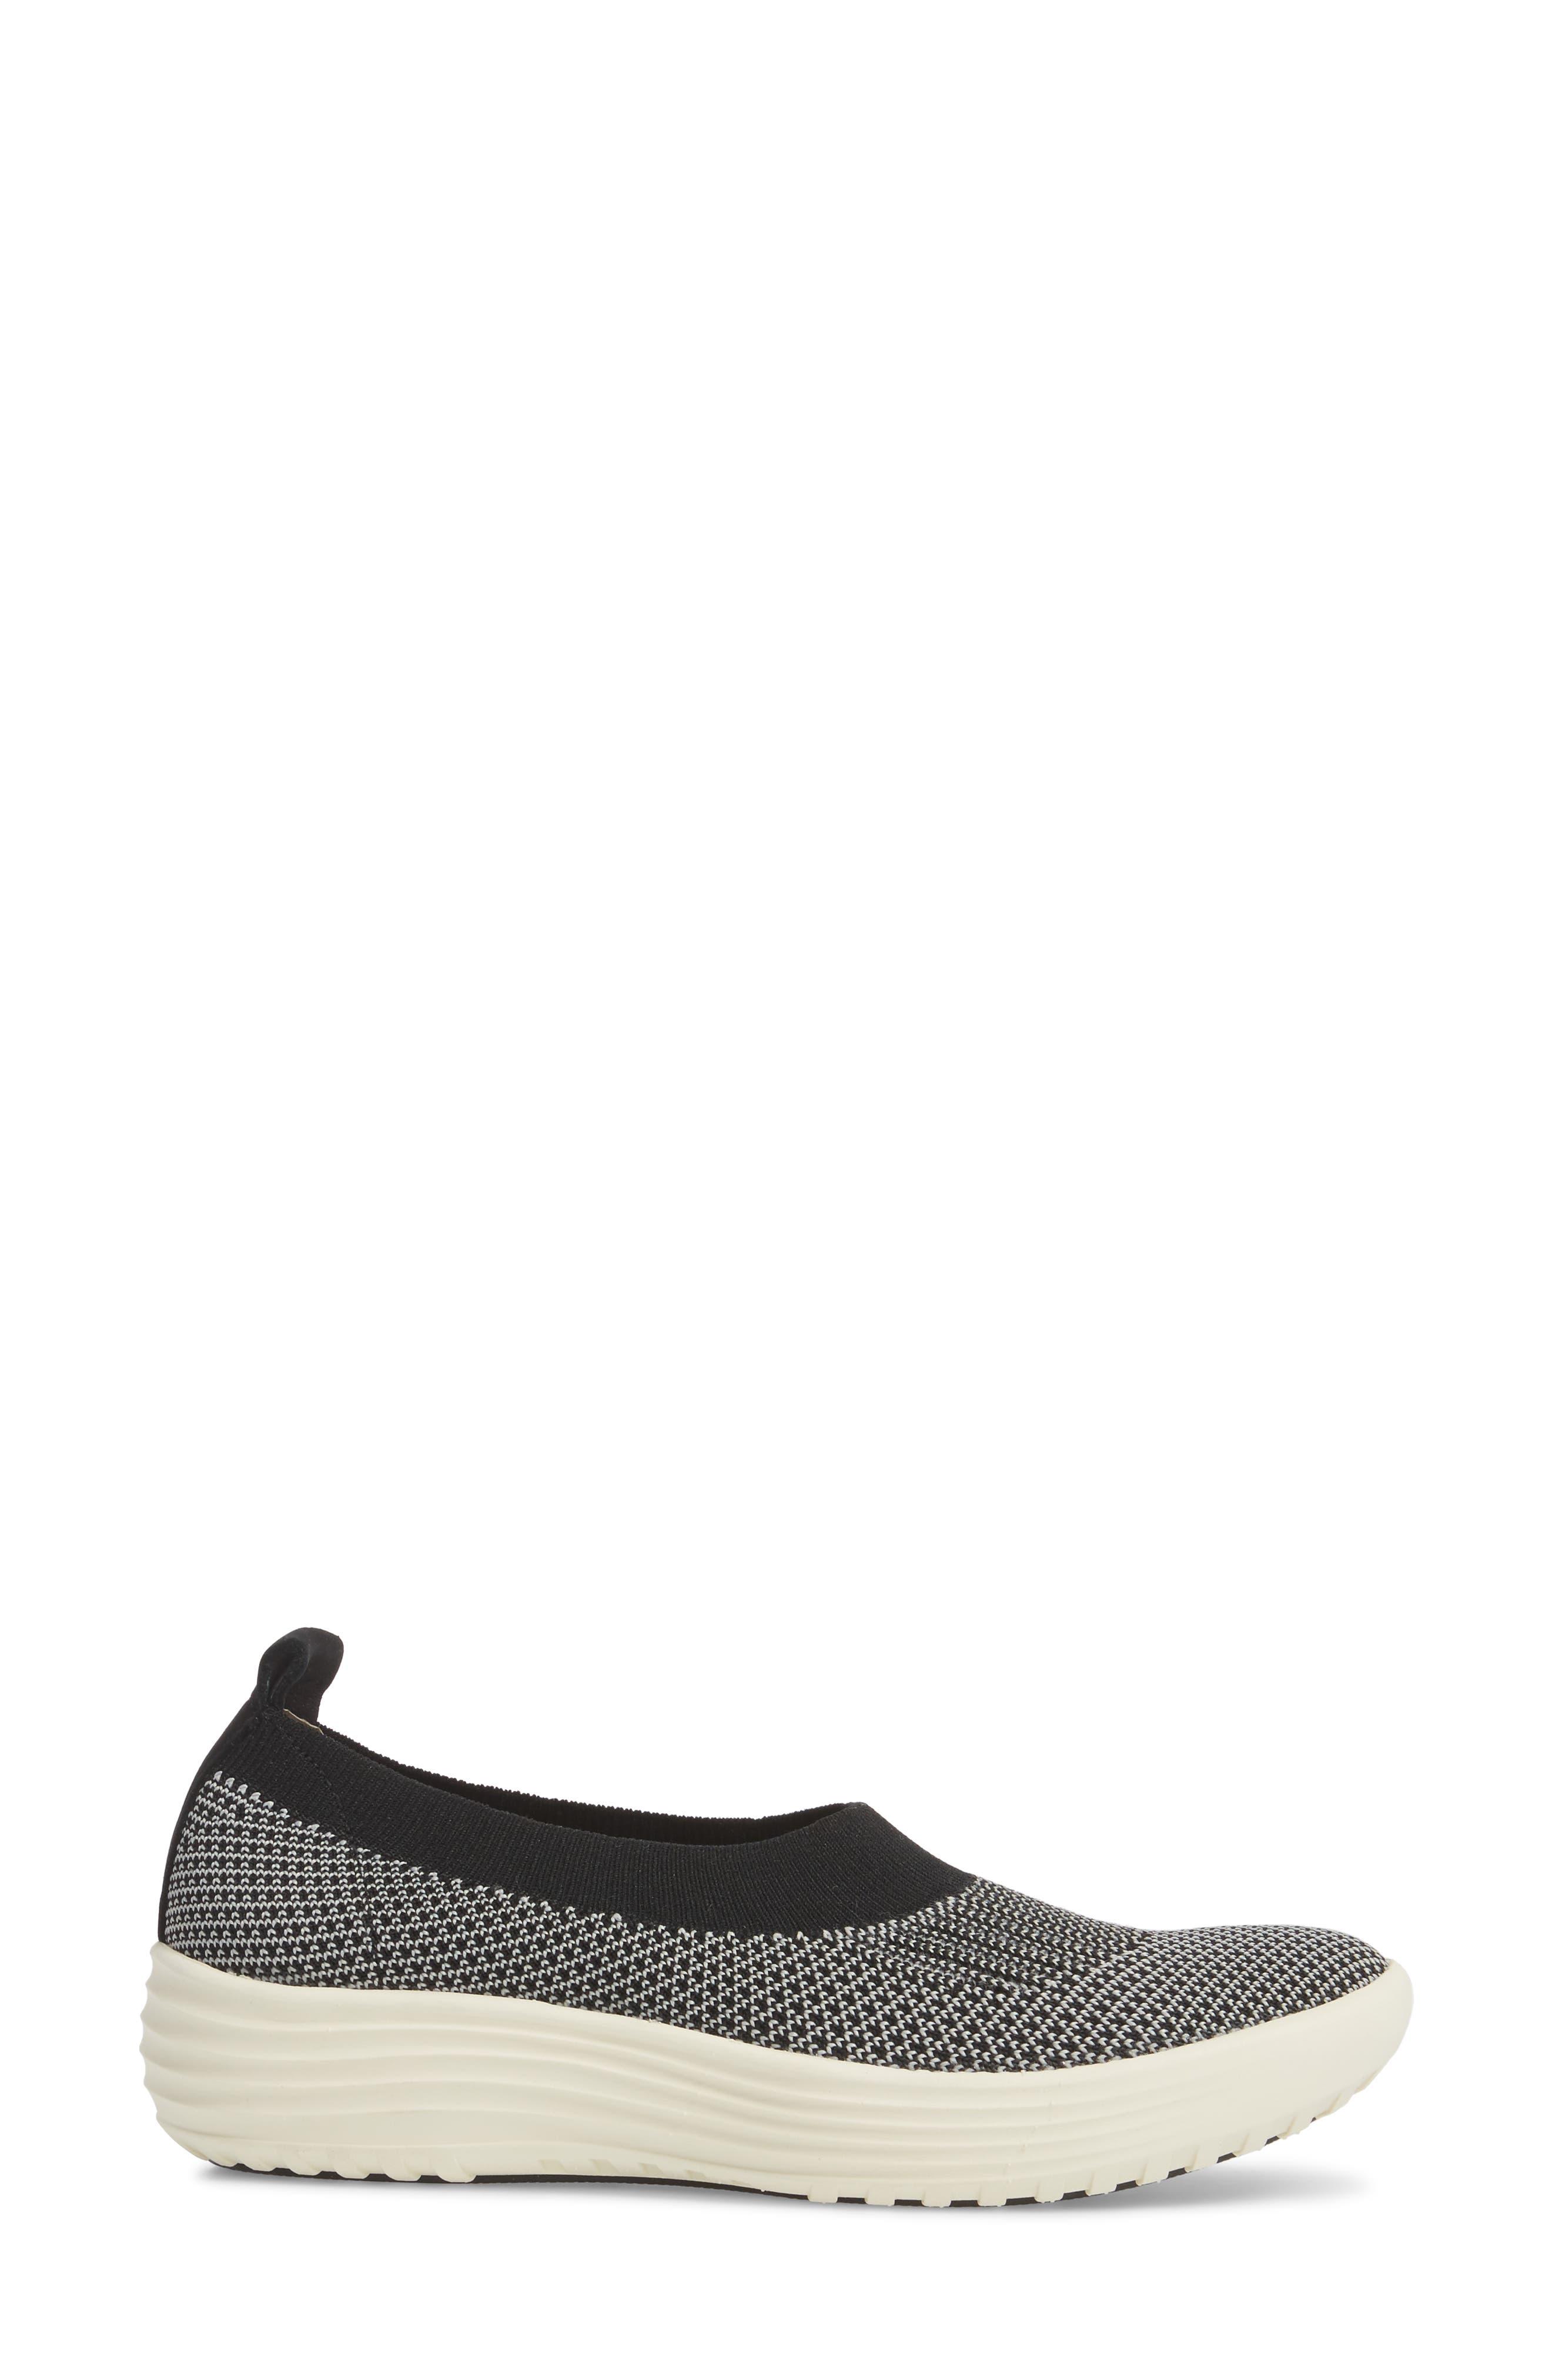 Merigold Slip-On Sock Fit Sneaker,                             Alternate thumbnail 3, color,                             BLACK/ MIST GREY FABRIC